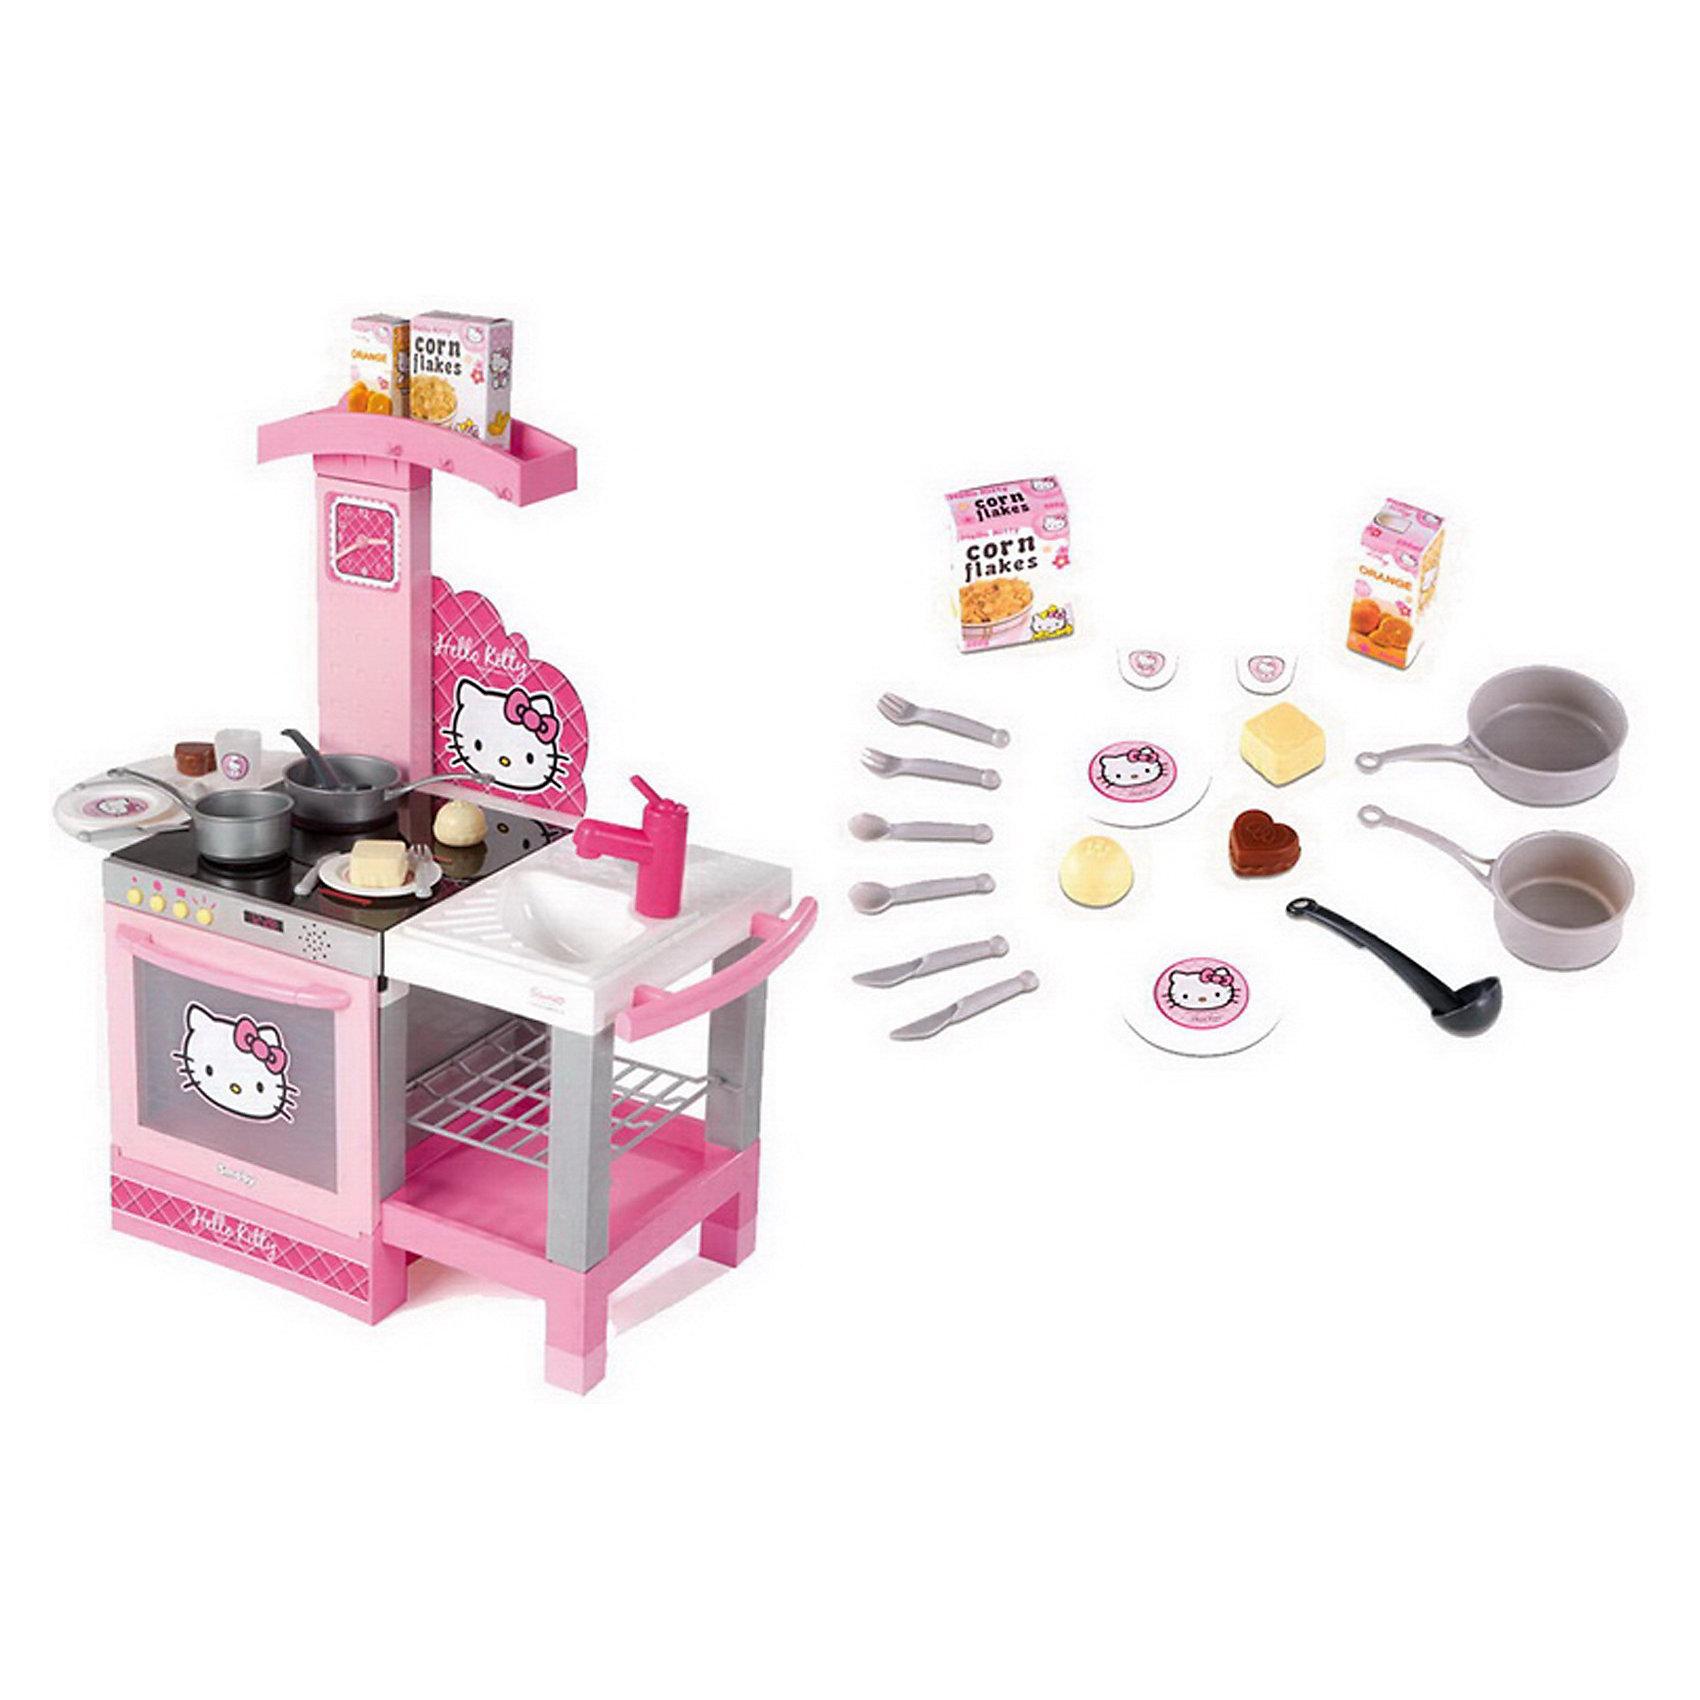 все цены на Smoby Hello Kitty Кухня, 60х31х58 см с аксессуарами. онлайн